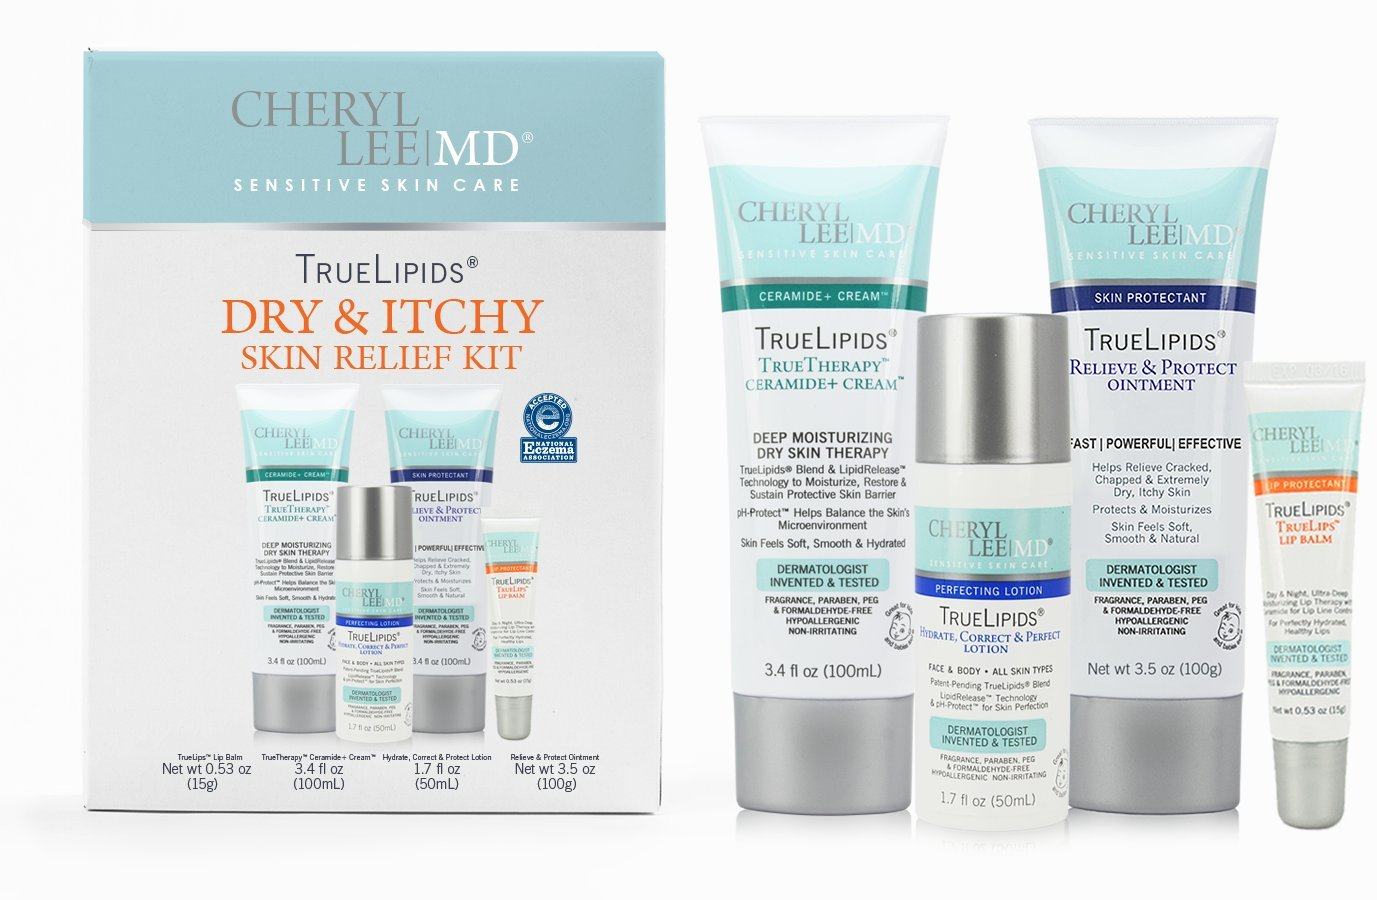 TrueLipids Dry & Itchy Skin Relief Moisturizing Cream & Lotion